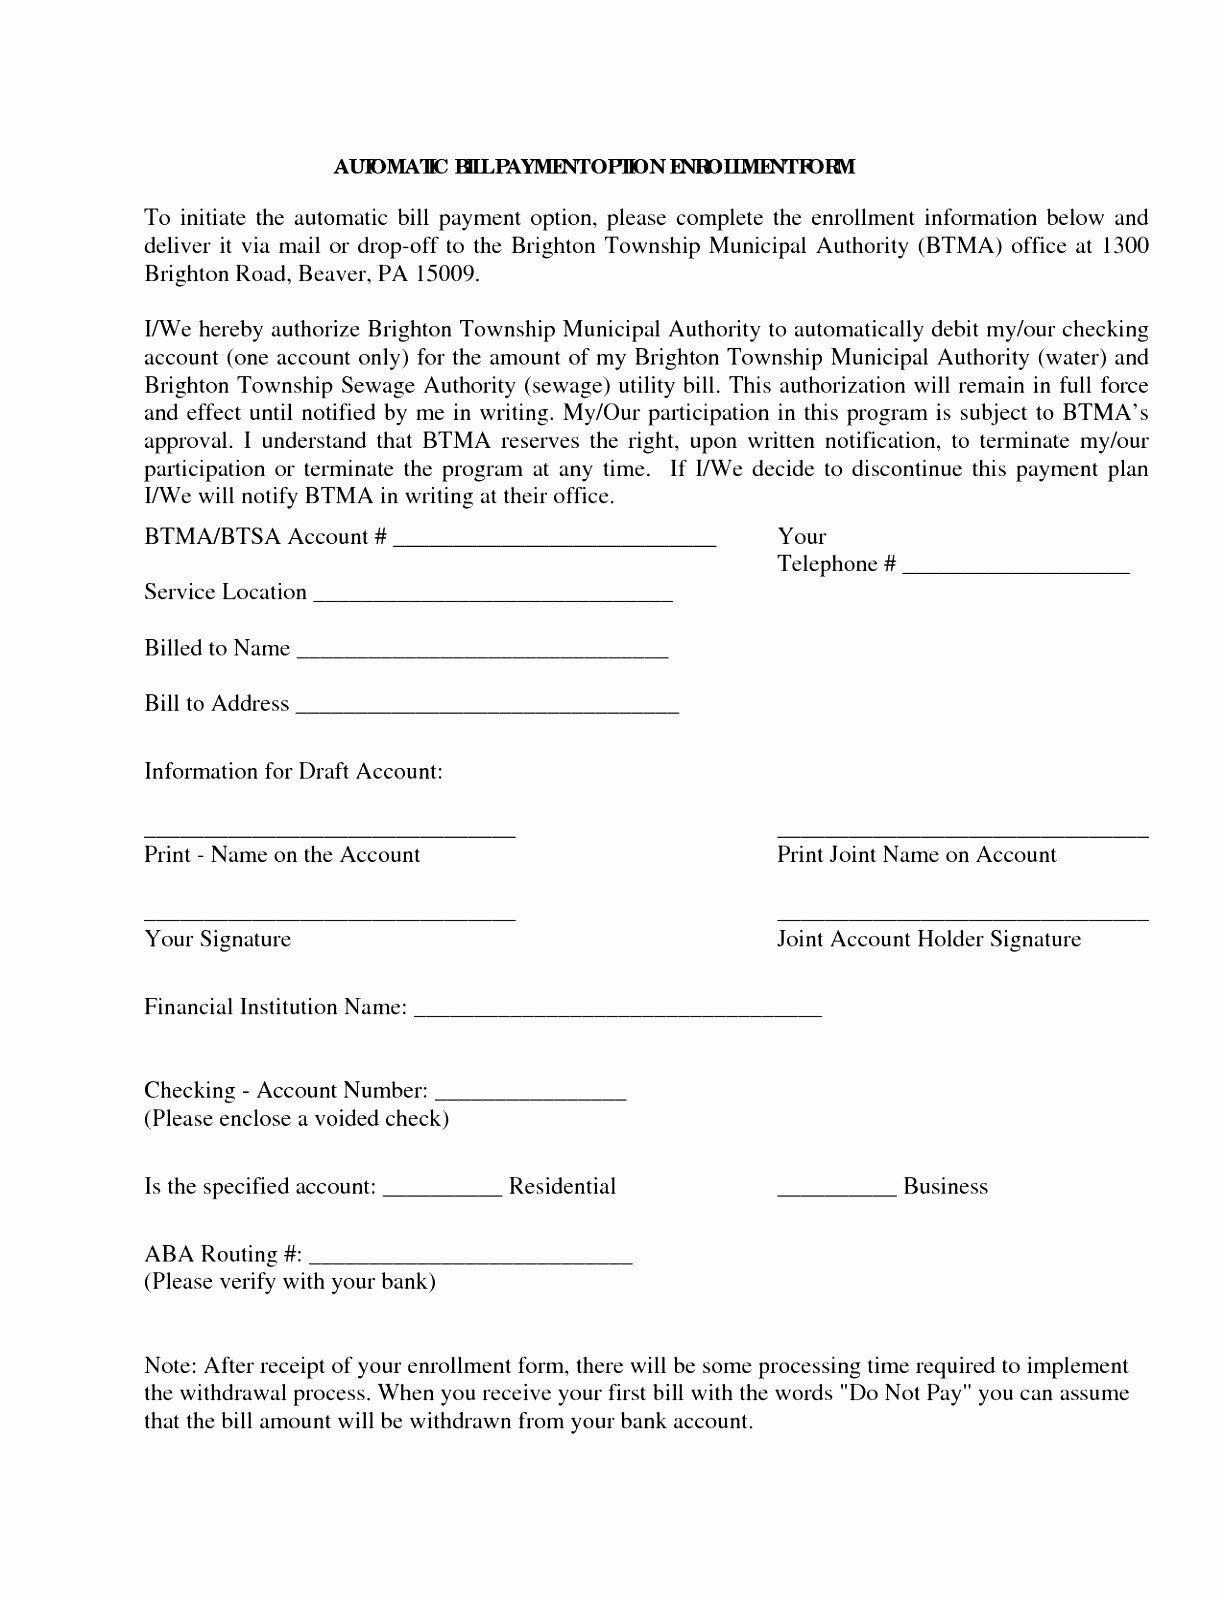 Payment Authorization Form Template Elegant 5 Automatic Payment Authorization Form Temp Address Label Template Restaurant Marketing Plan Questionnaire Template